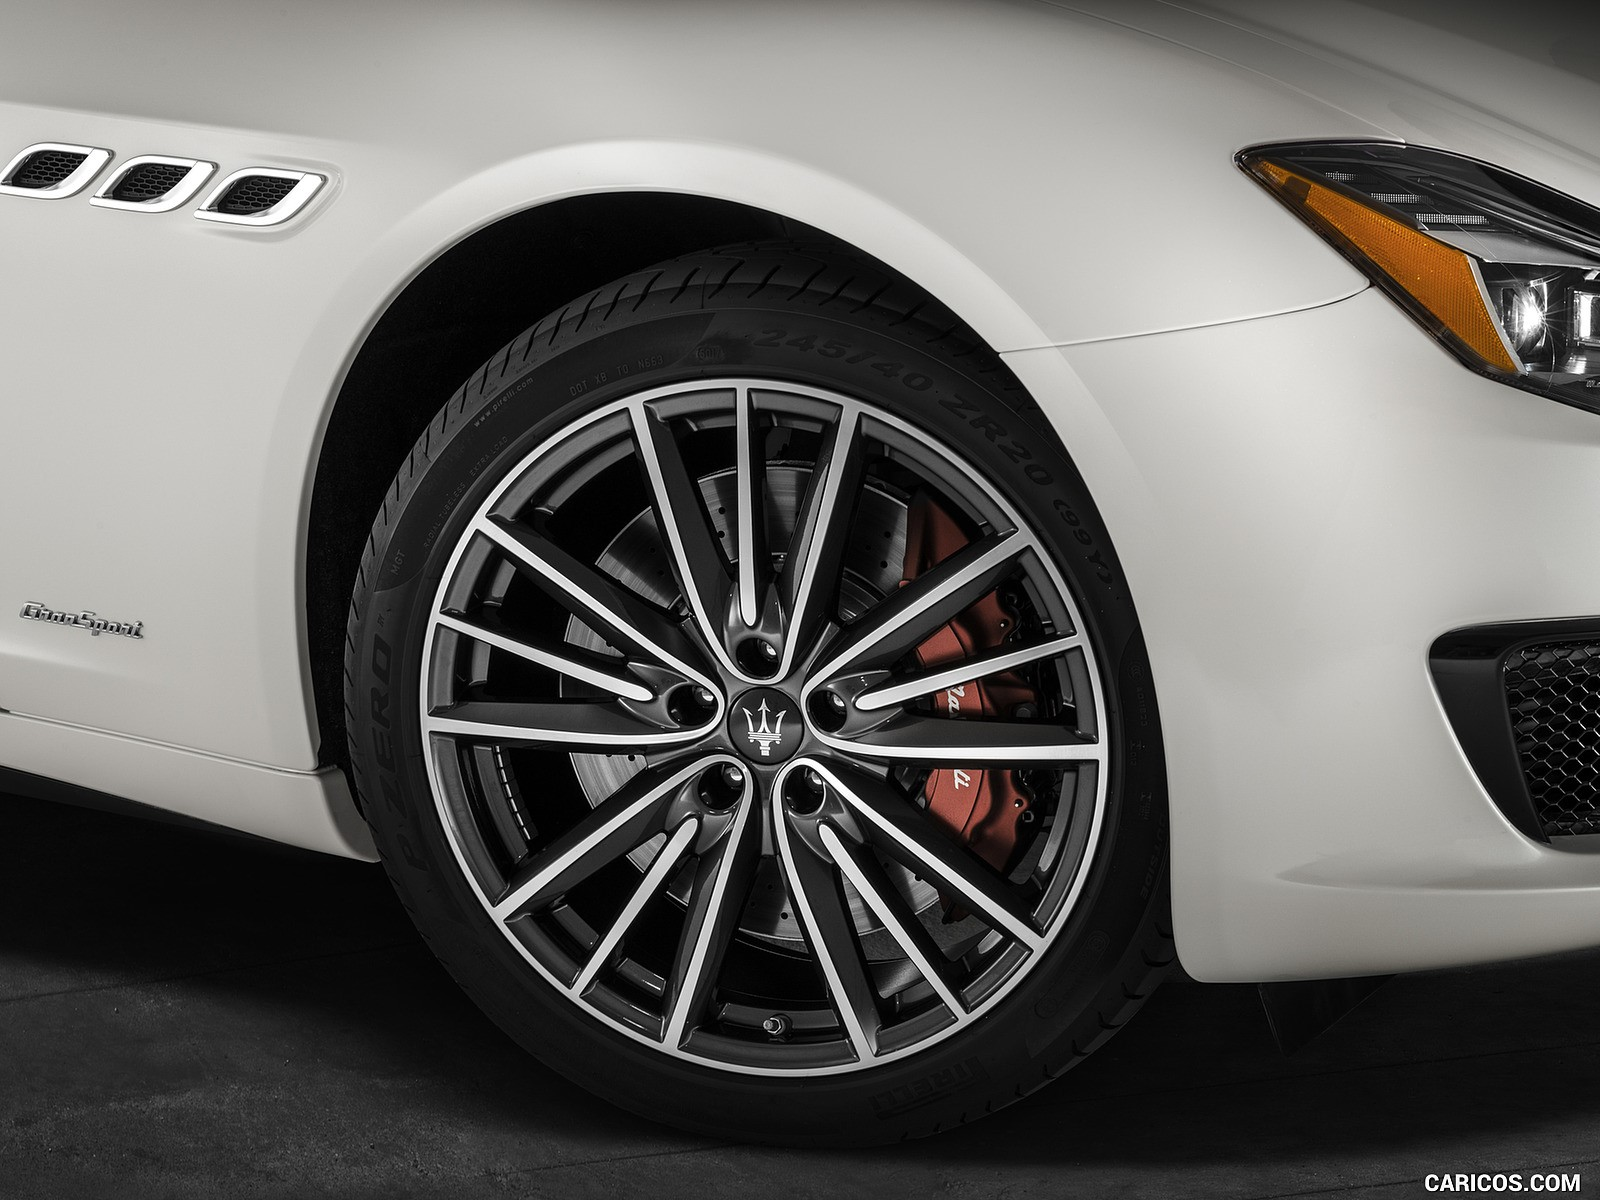 Maserati Quattroporte 2019 hd fotoları